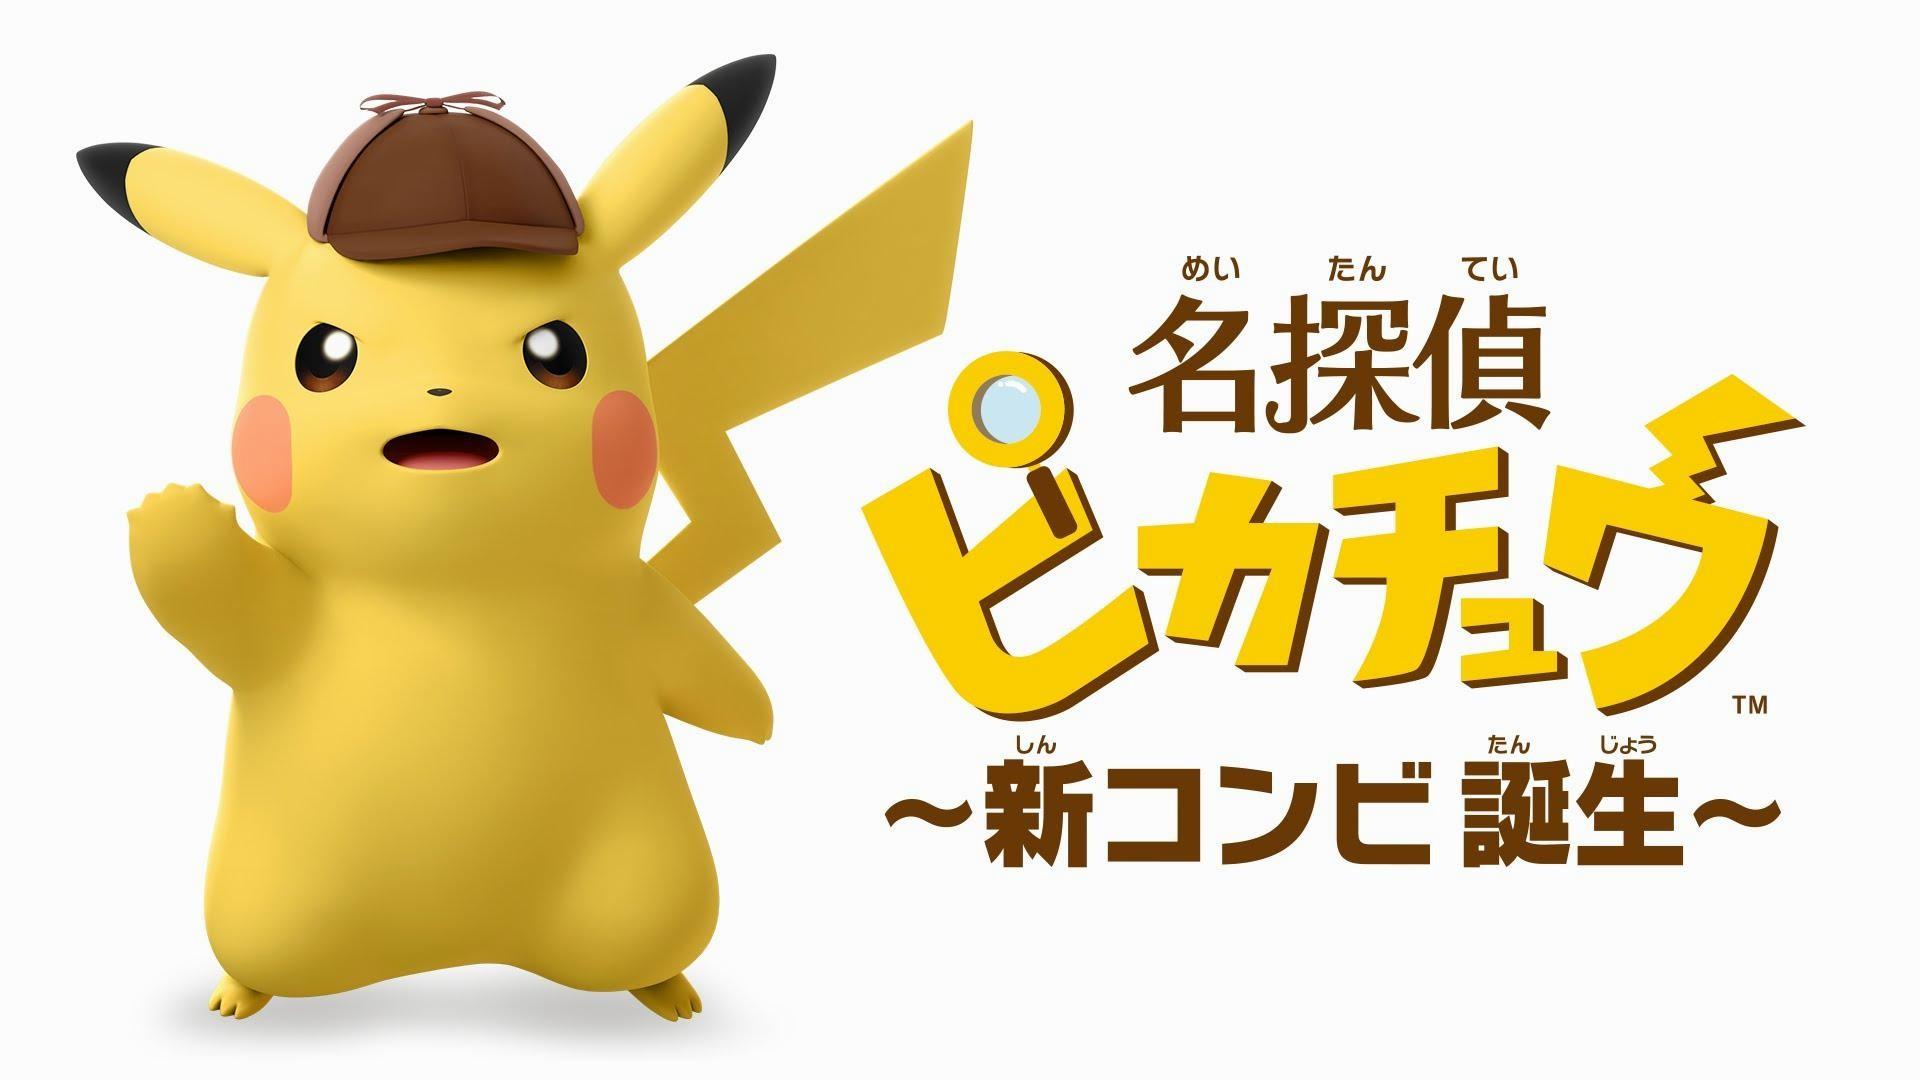 Download-free-Cute-Pikachu-Wallpapers-HD